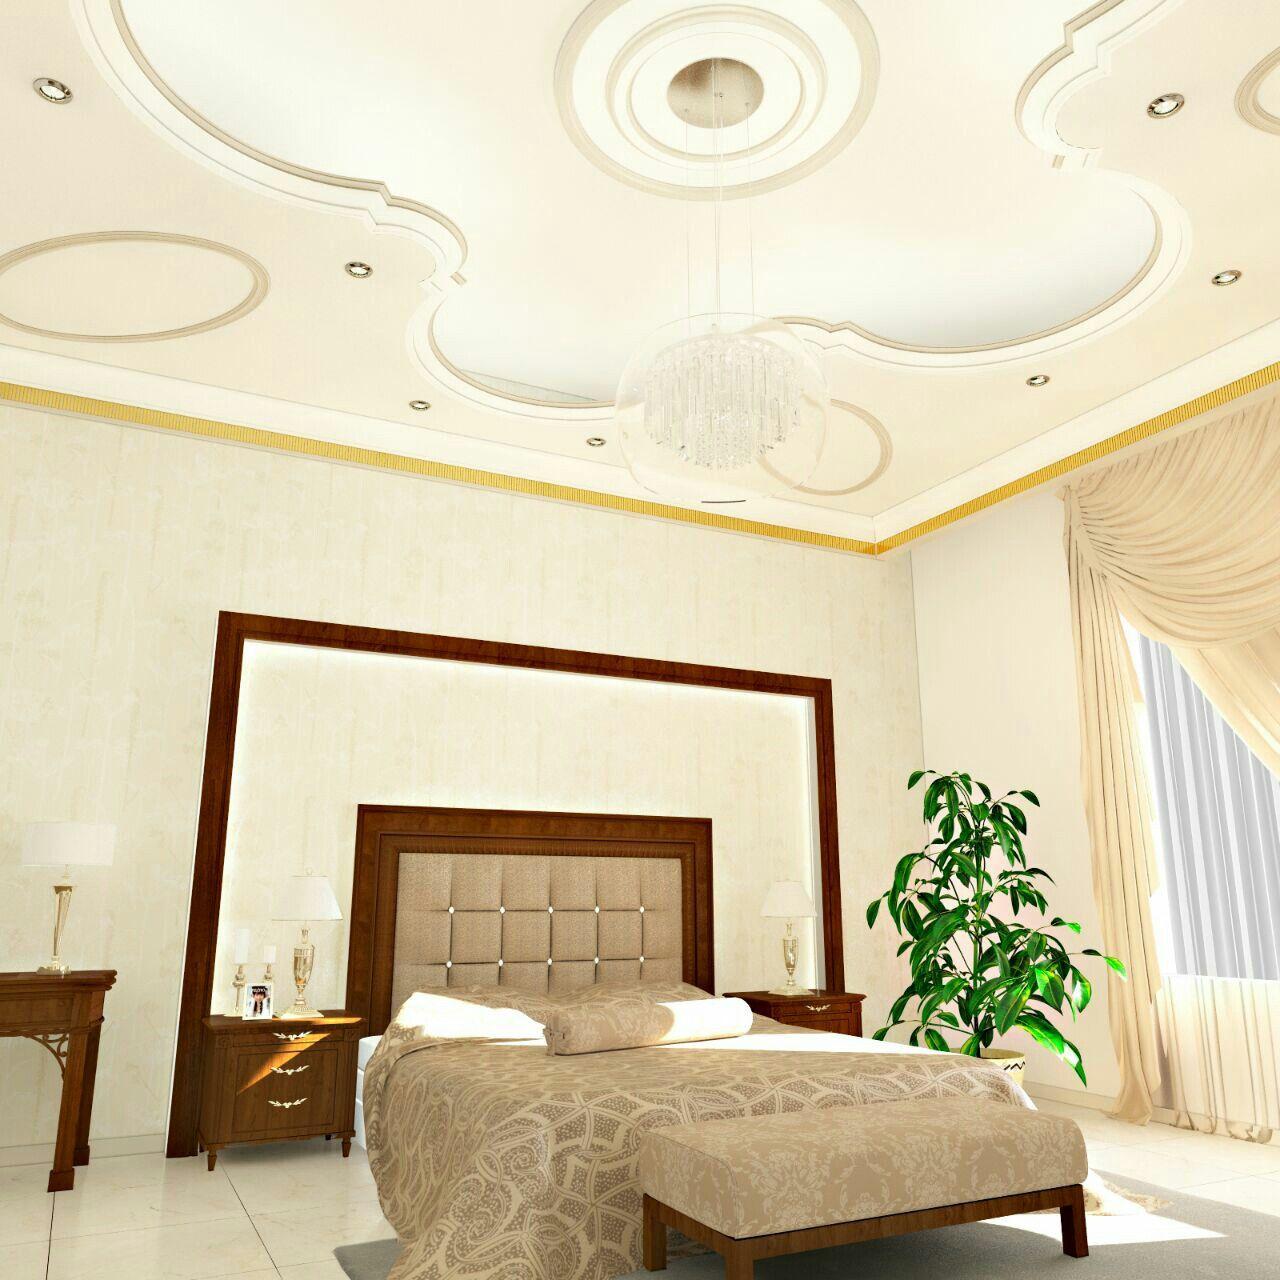 Kids bedroom #false #ceiling   Ceilings design   Pinterest ...